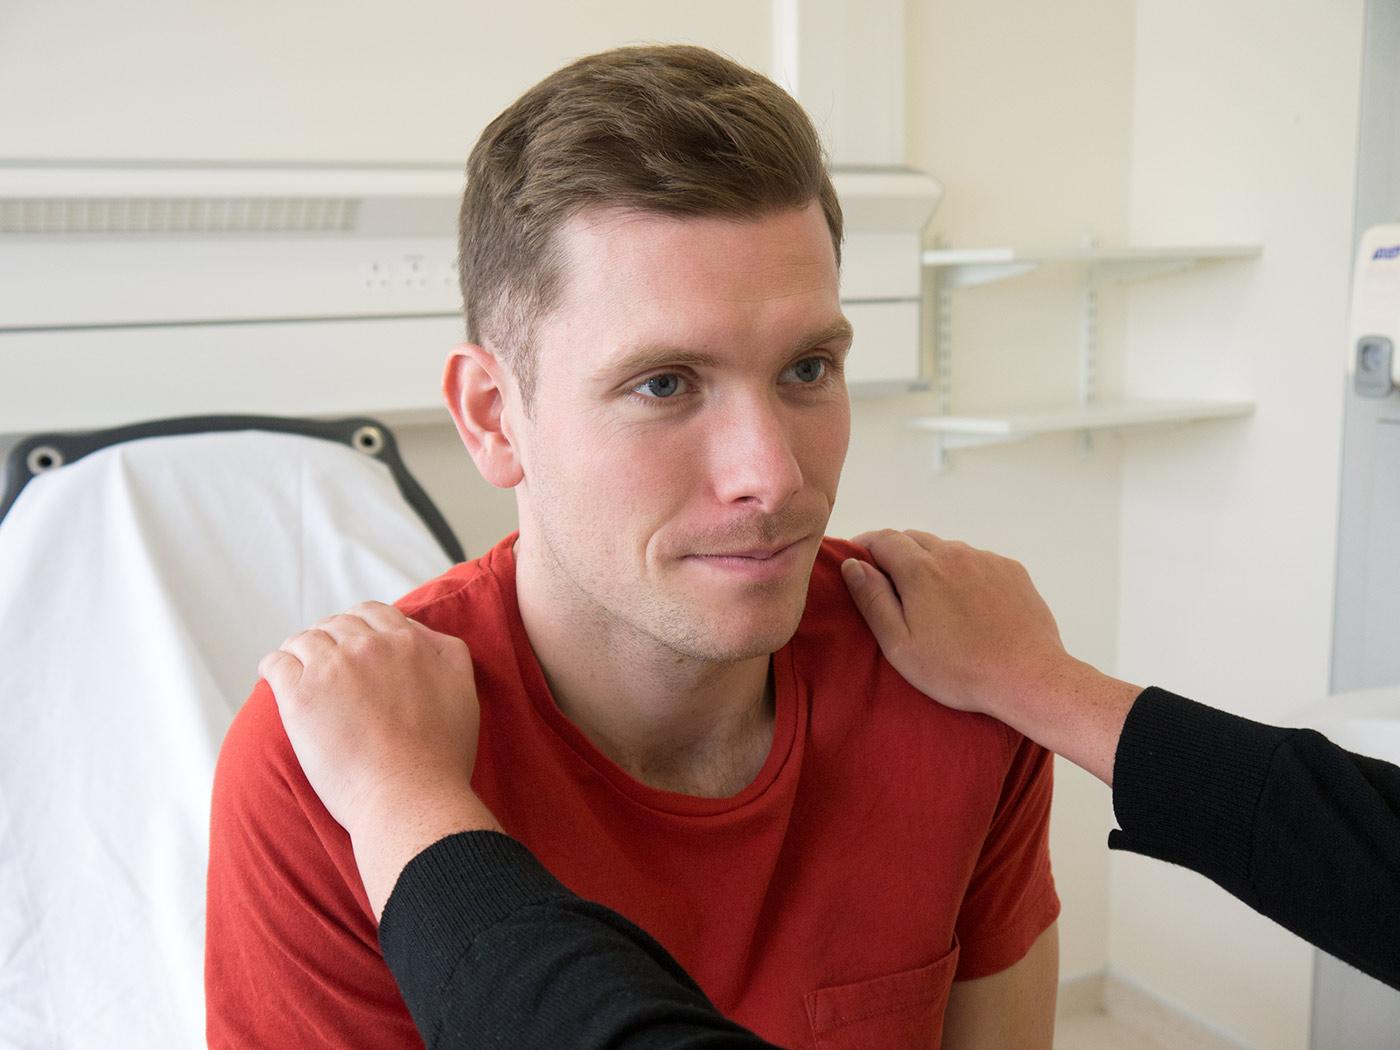 Trapezius muscle test against resistance